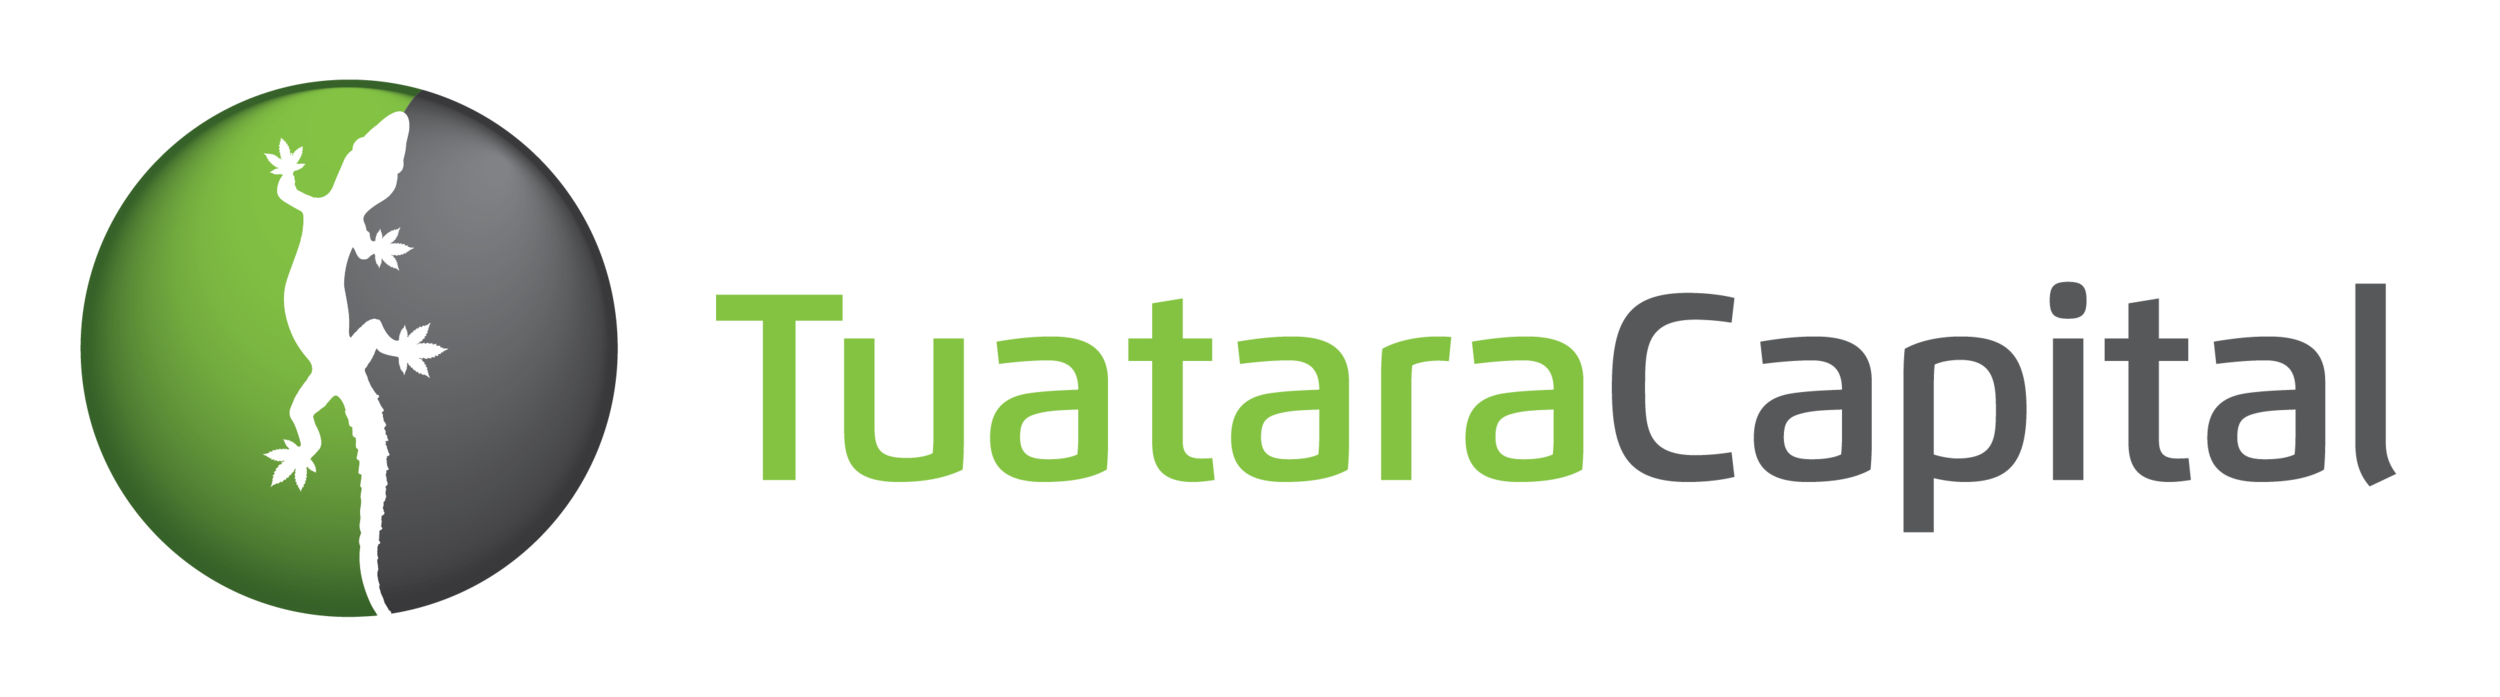 TuataraCapital_large.png